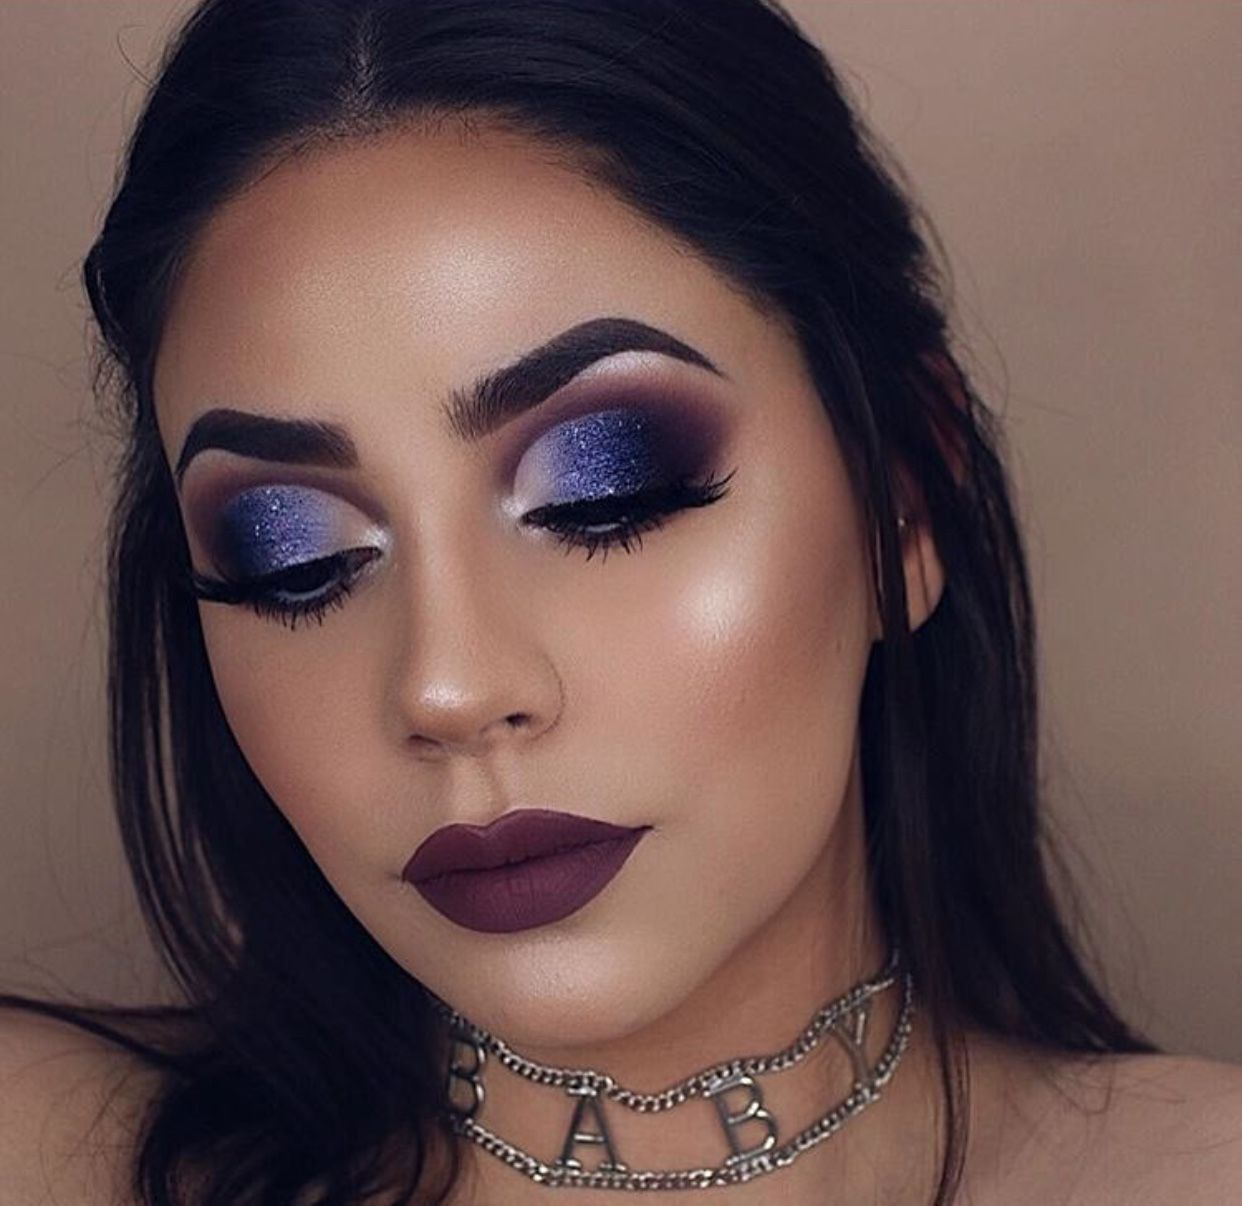 Wearing heavy eye makeup fetish